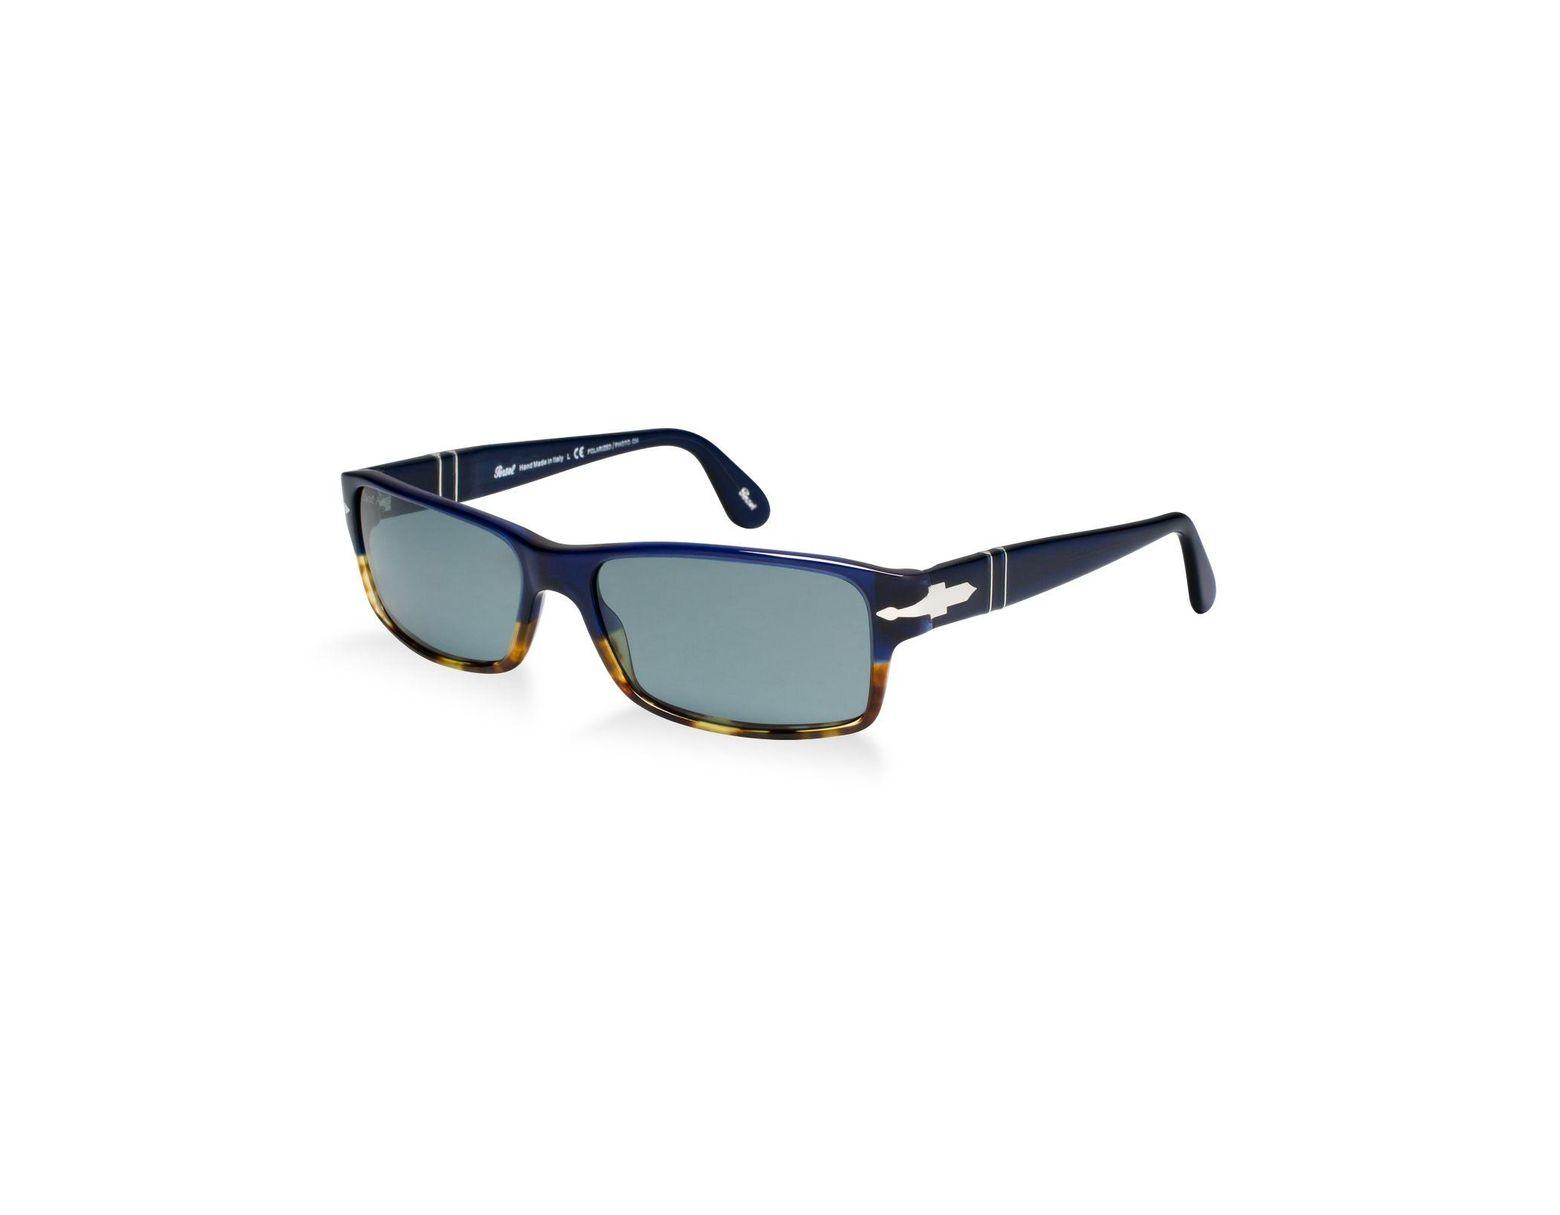 407141b92d4b Persol Polarized Sunglasses , Po2747s (57) in Blue for Men - Lyst